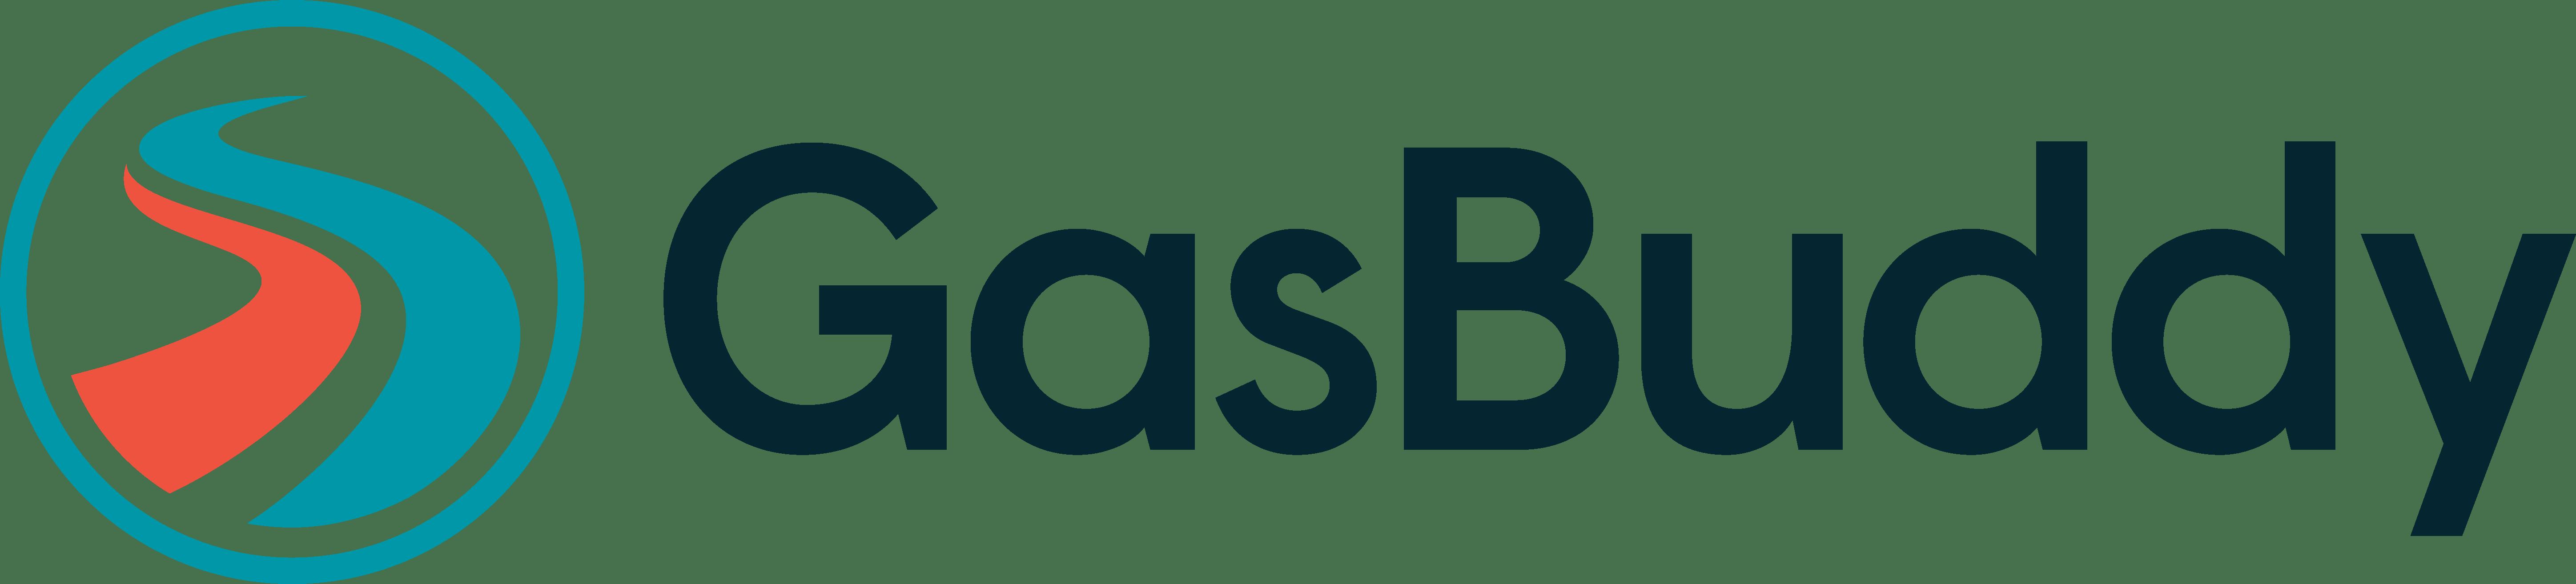 GasBuddy: A Platform for Crowdsourced Gas Price Data - Digital Innovation and Transformation